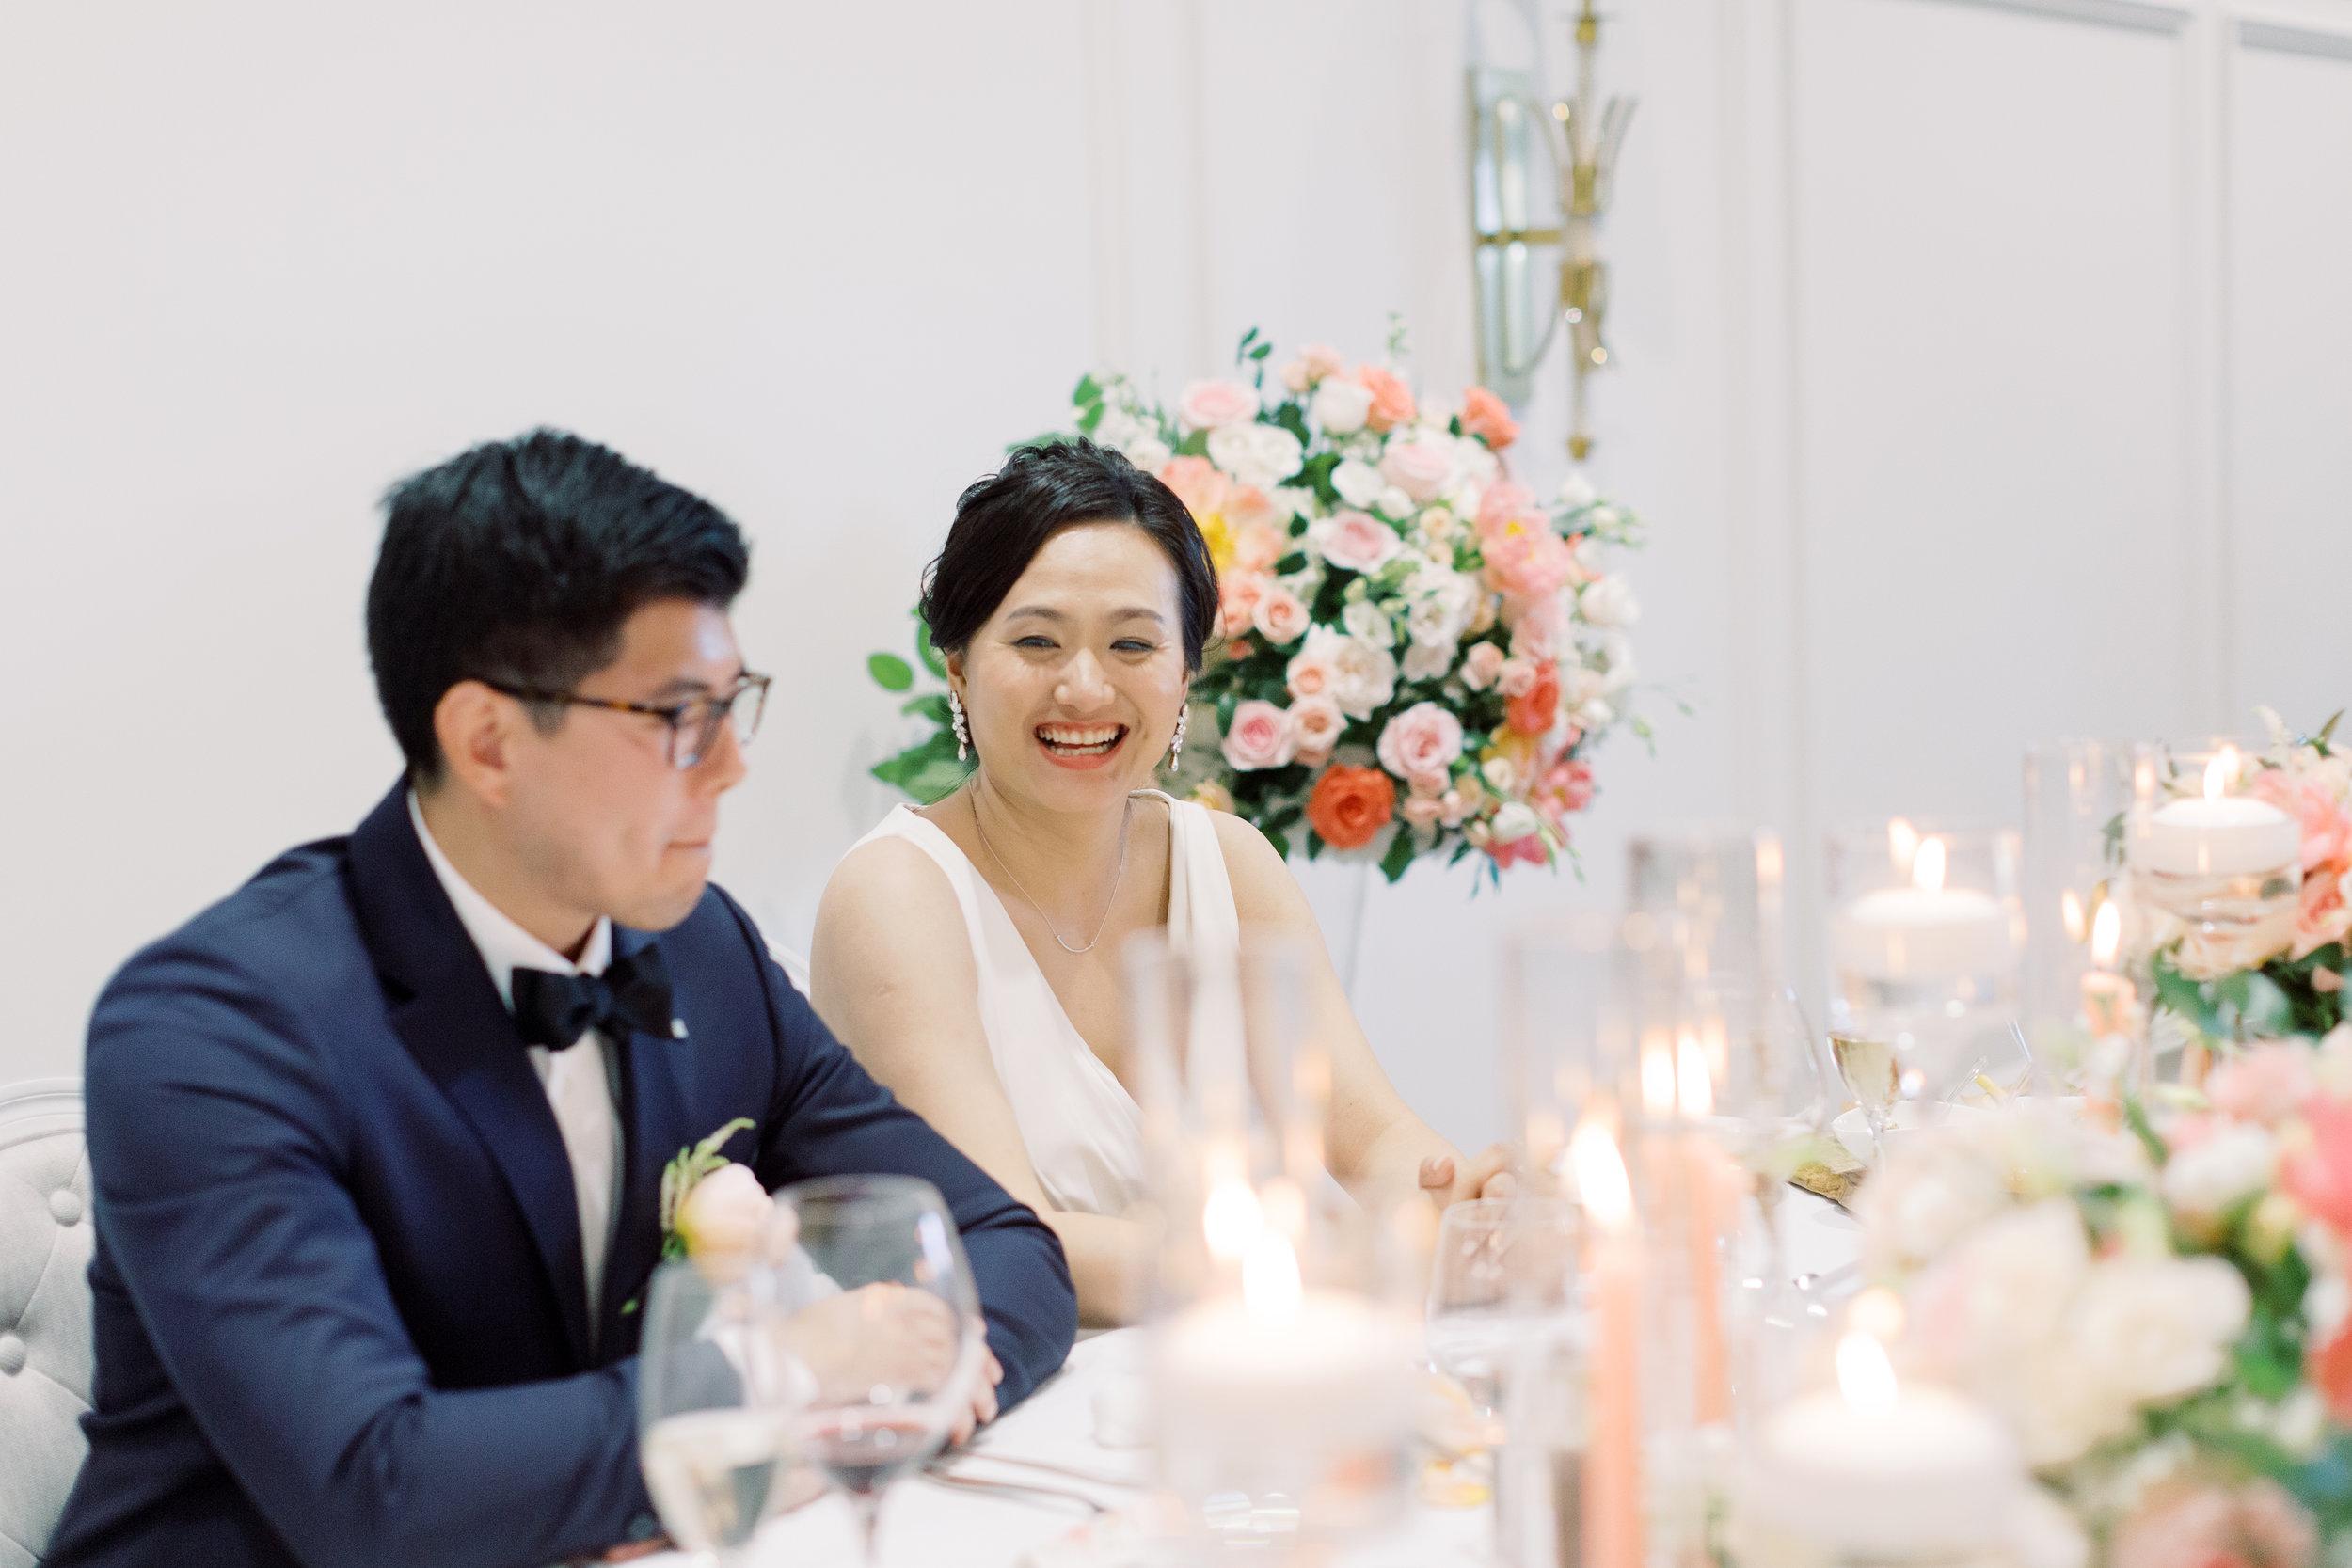 Arlington Estate Wedding - Reception-121.jpg